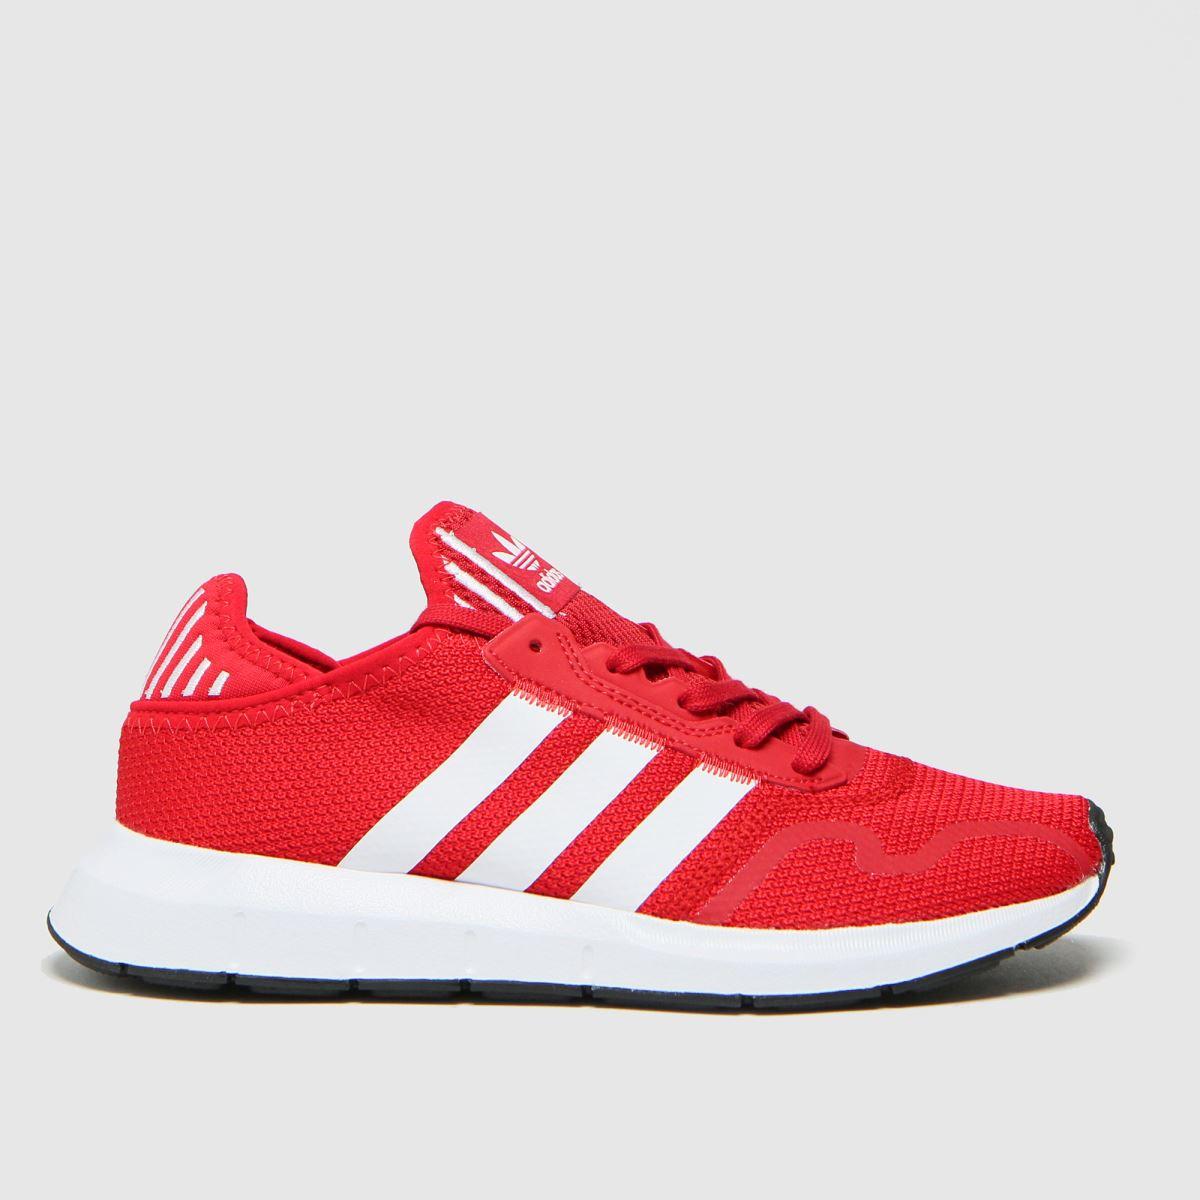 Adidas Red Swift Run X Trainers